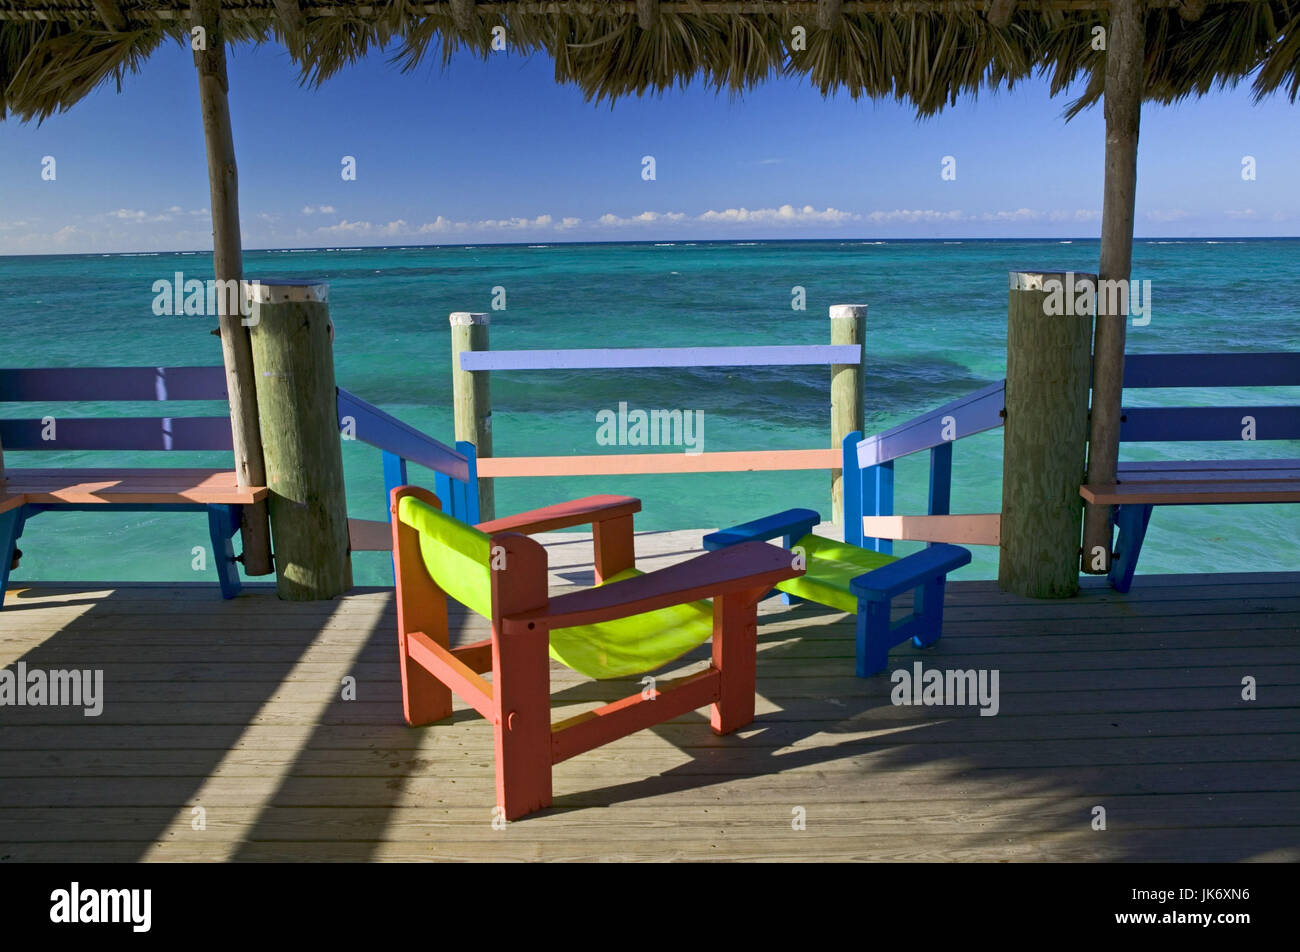 Bahamas Ozean Steg Stuhle Bunt Aussicht Stock Photo Alamy